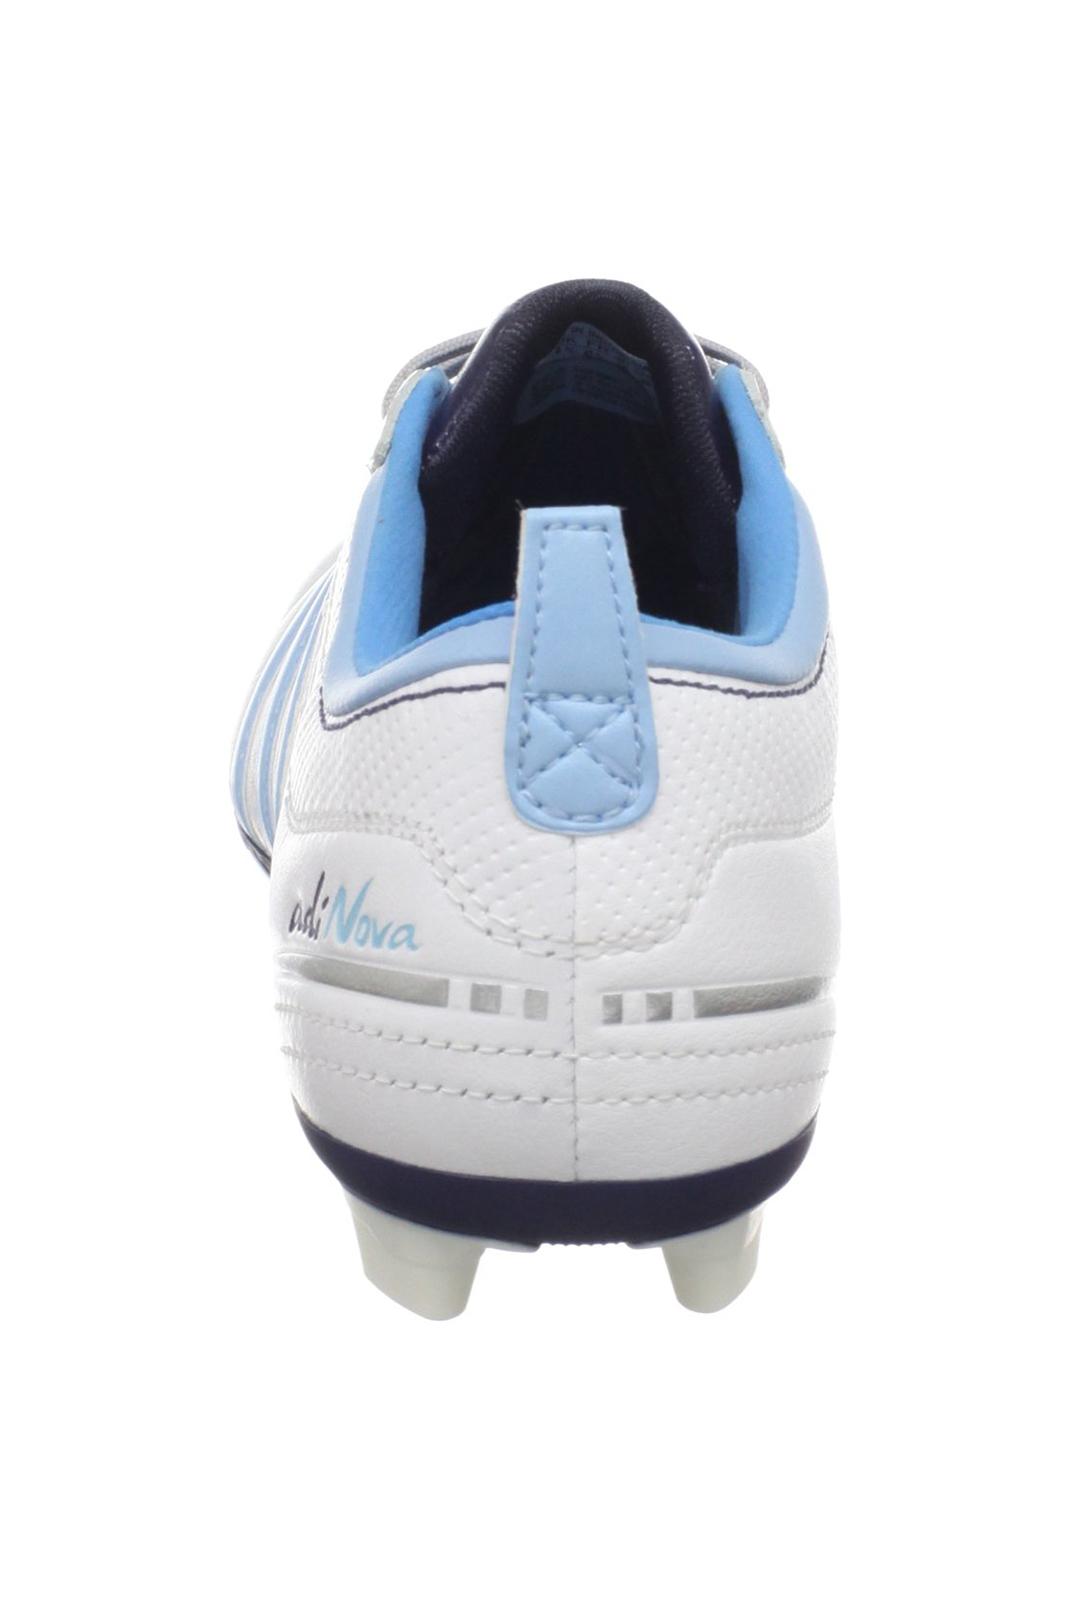 Baskets / Sneakers  Adidas G41682 ADINOVA IV BLANC